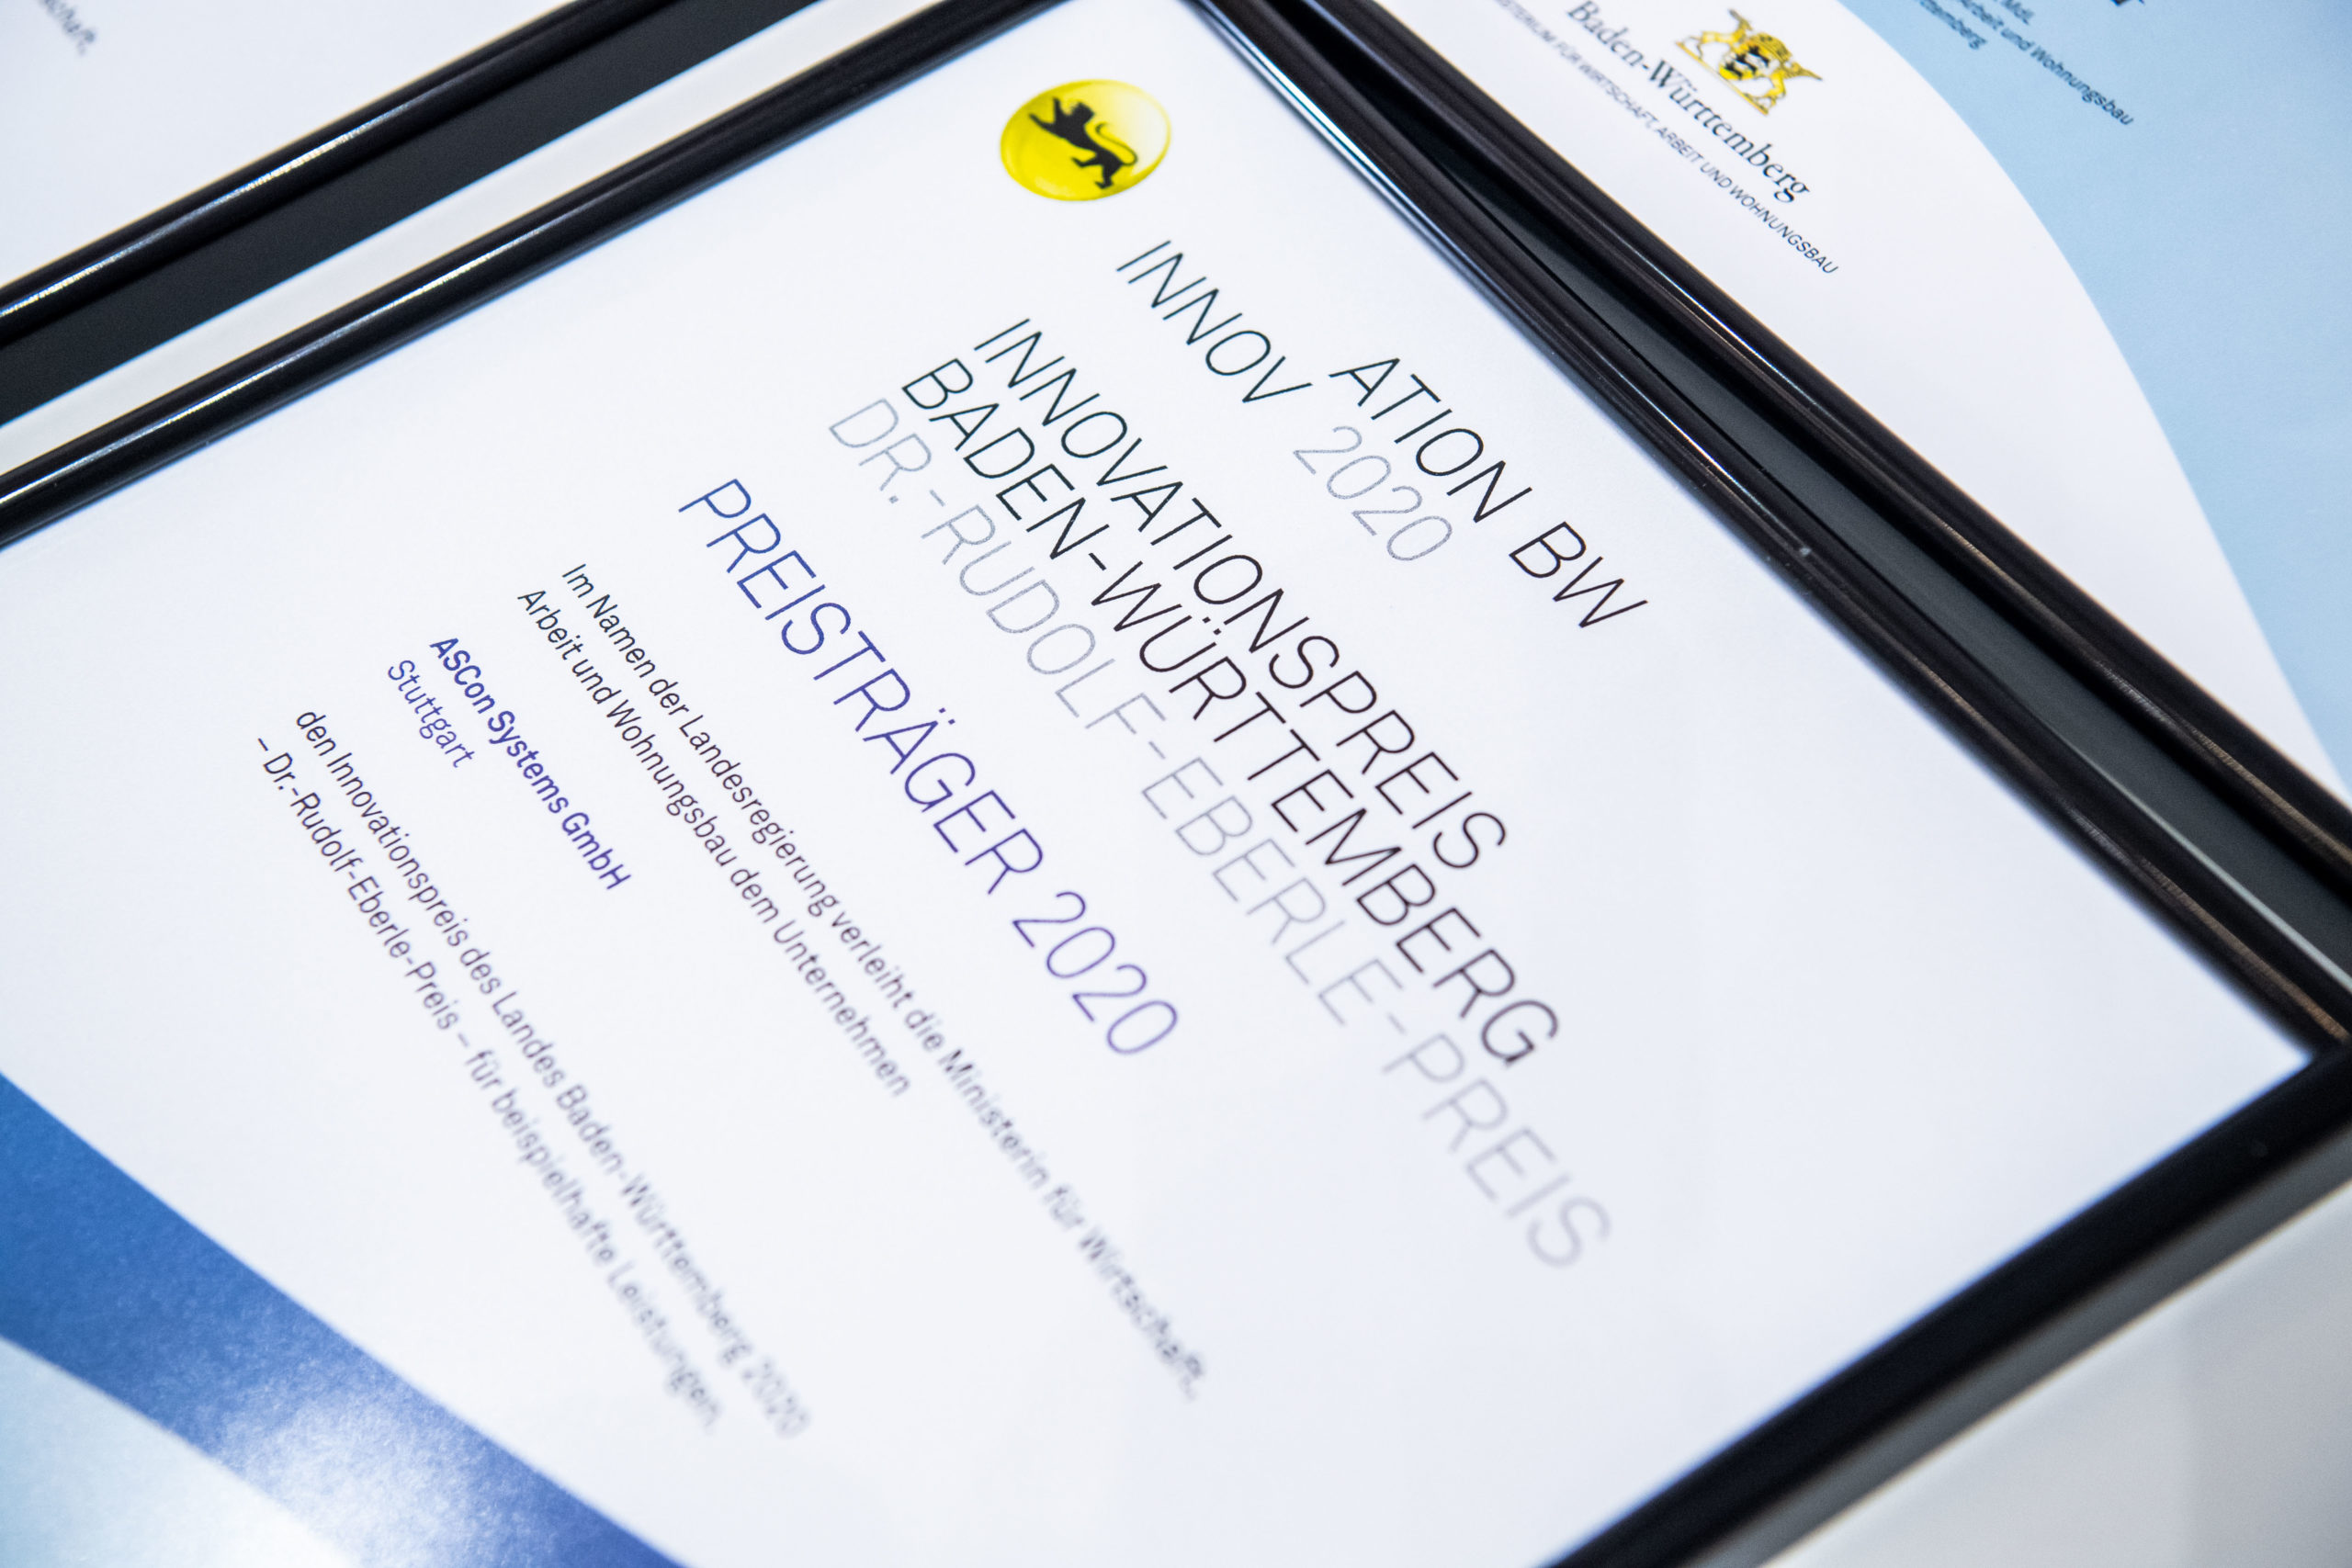 Innovationspreis des Landes BW 2020